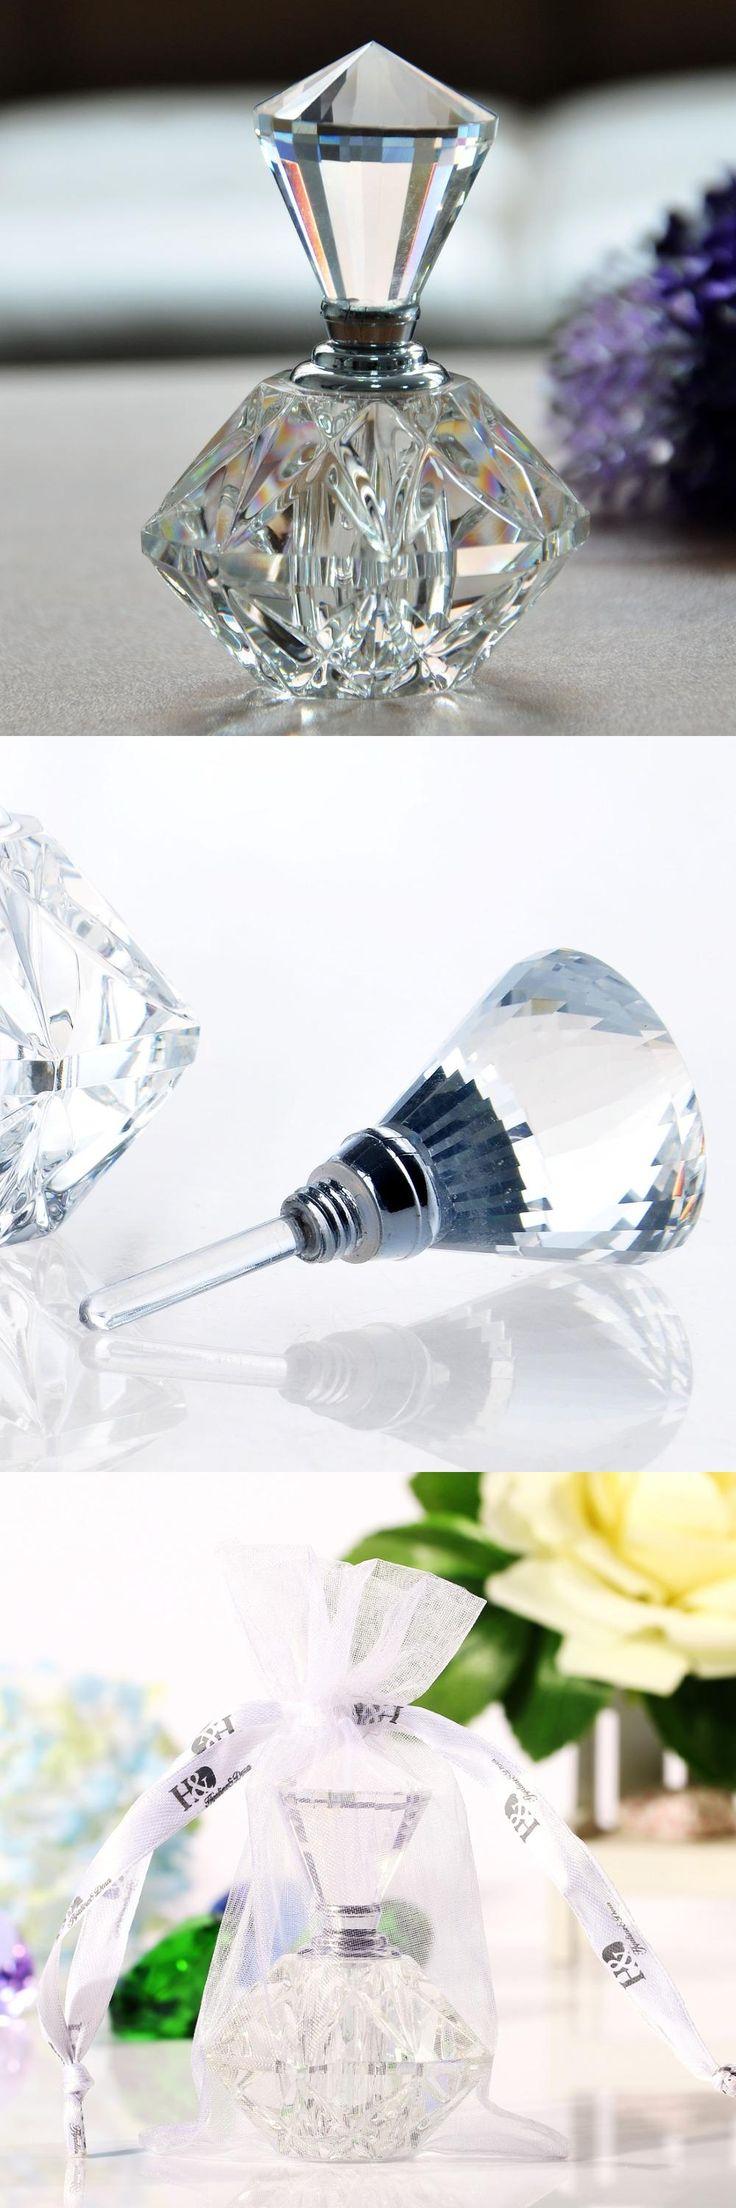 [Visit to Buy] 2016 New Hot Women Mini Crystal Cut Transparant Perfume Bottle Glass Bottle Refillable Gift Empty Refillable Perfume Bottle #Advertisement